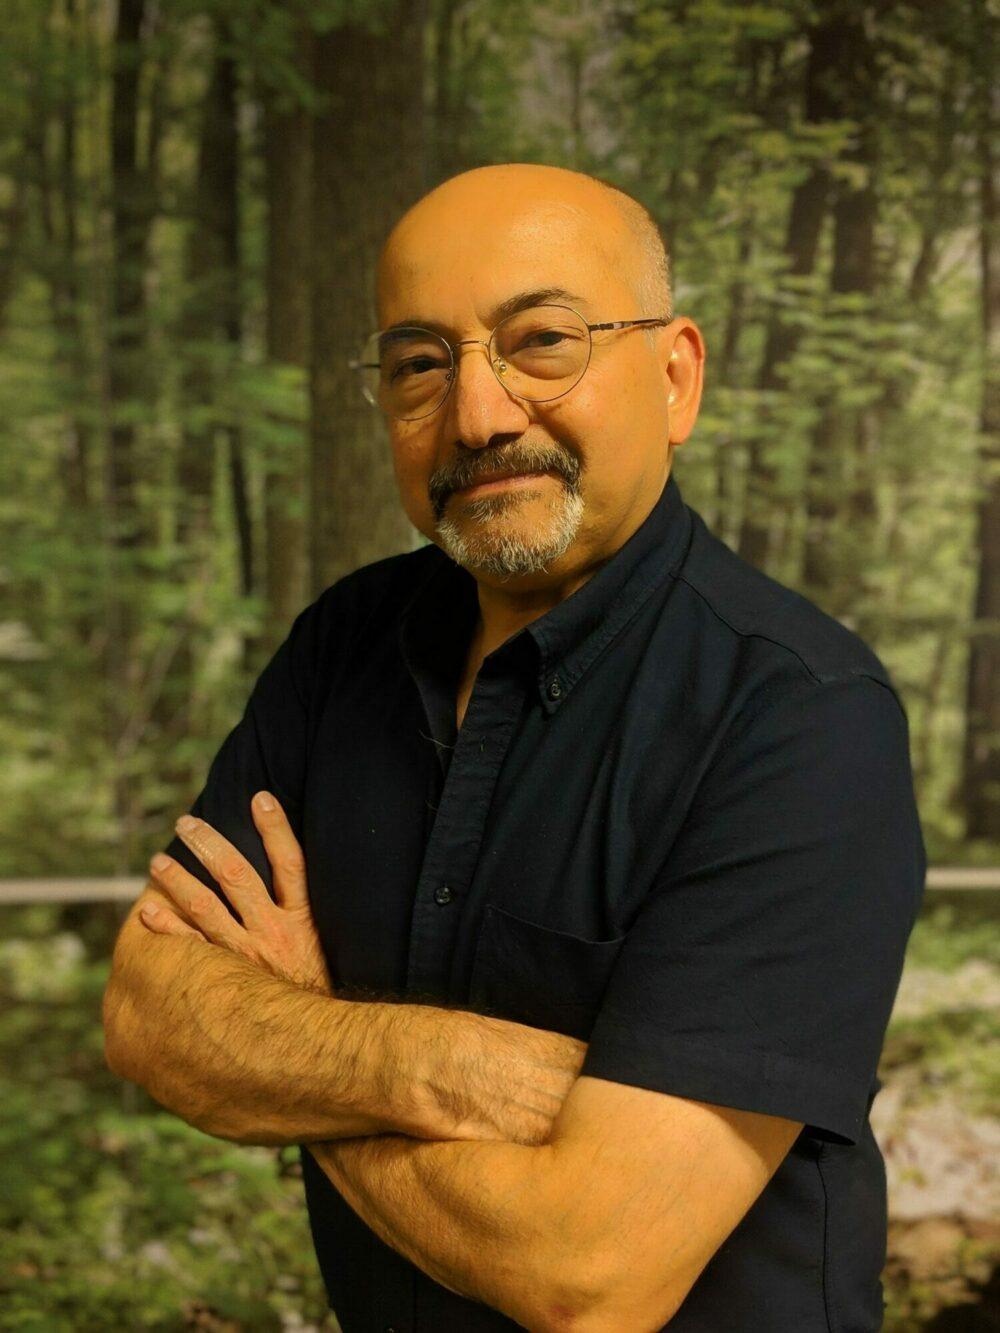 Masoud Moinfar